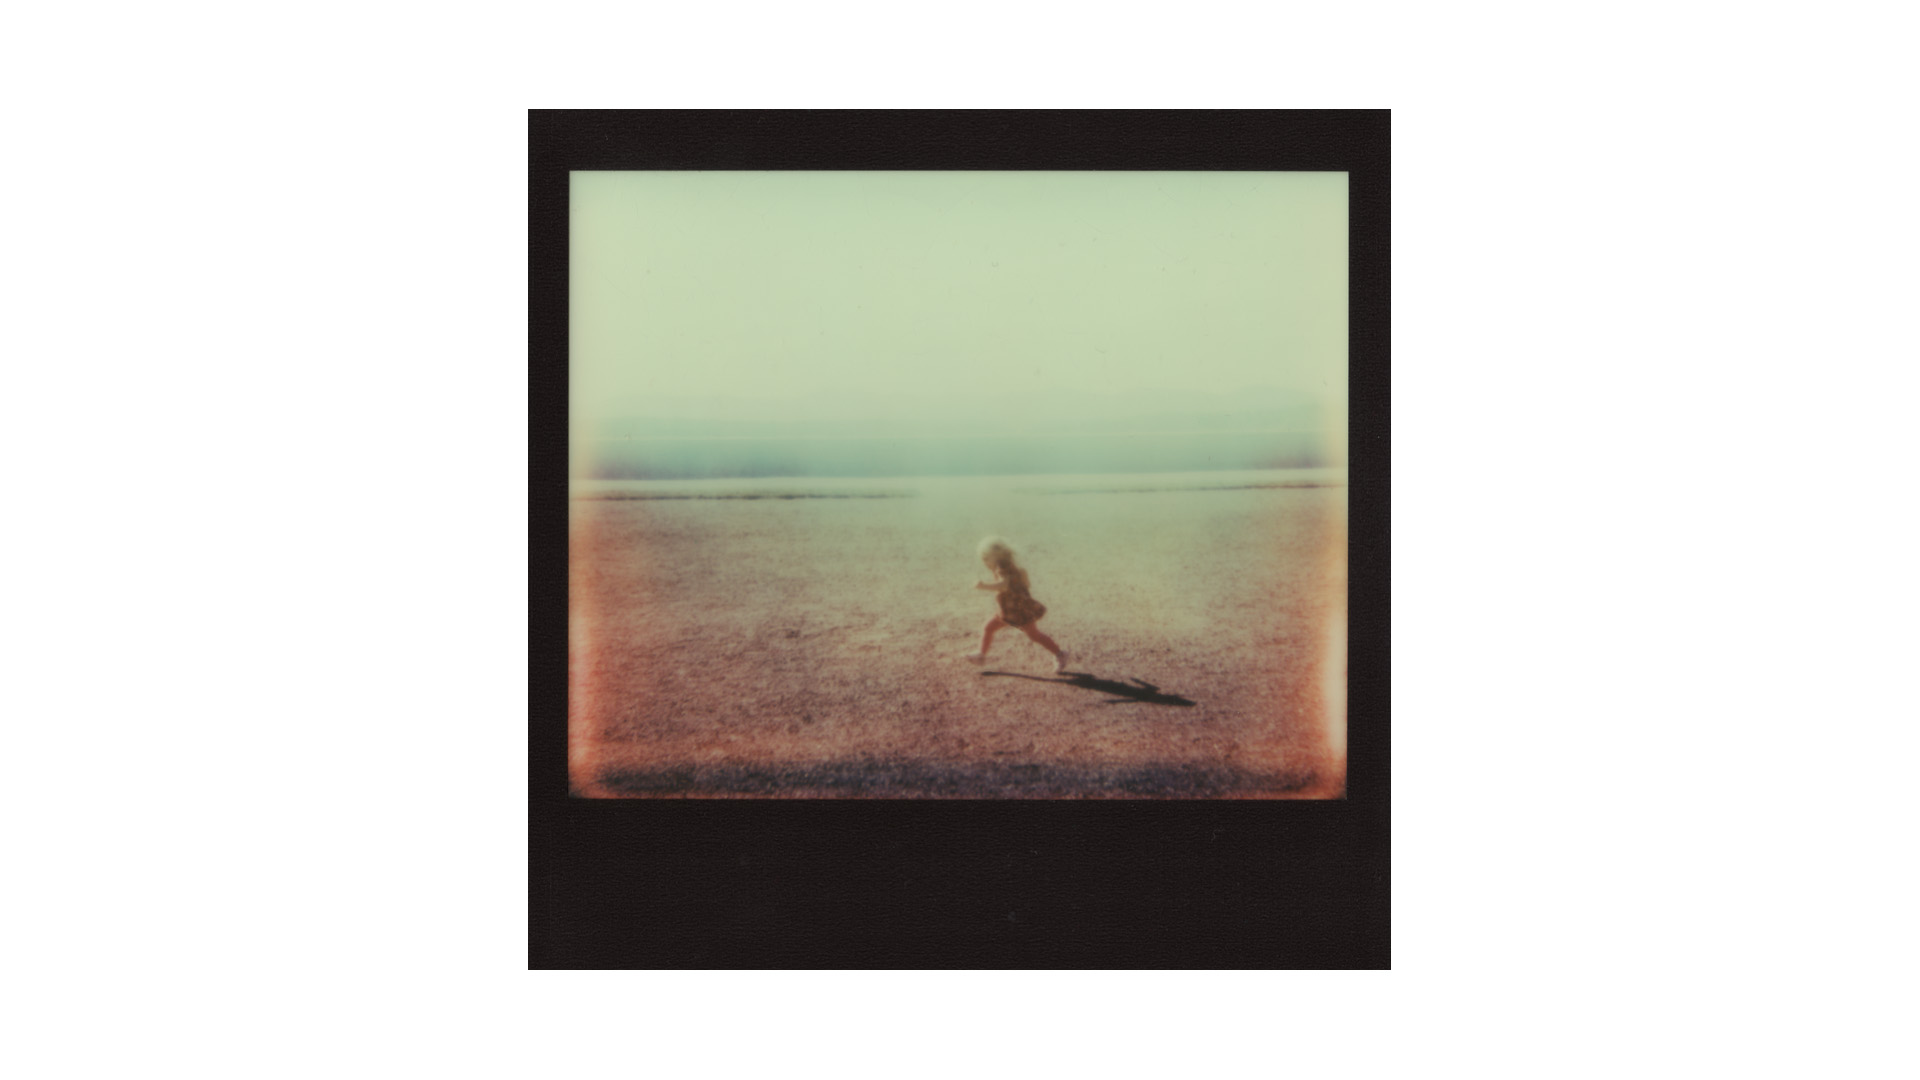 polaroid SPECTRA portrait of child running // (c) jocelynmathewes.com